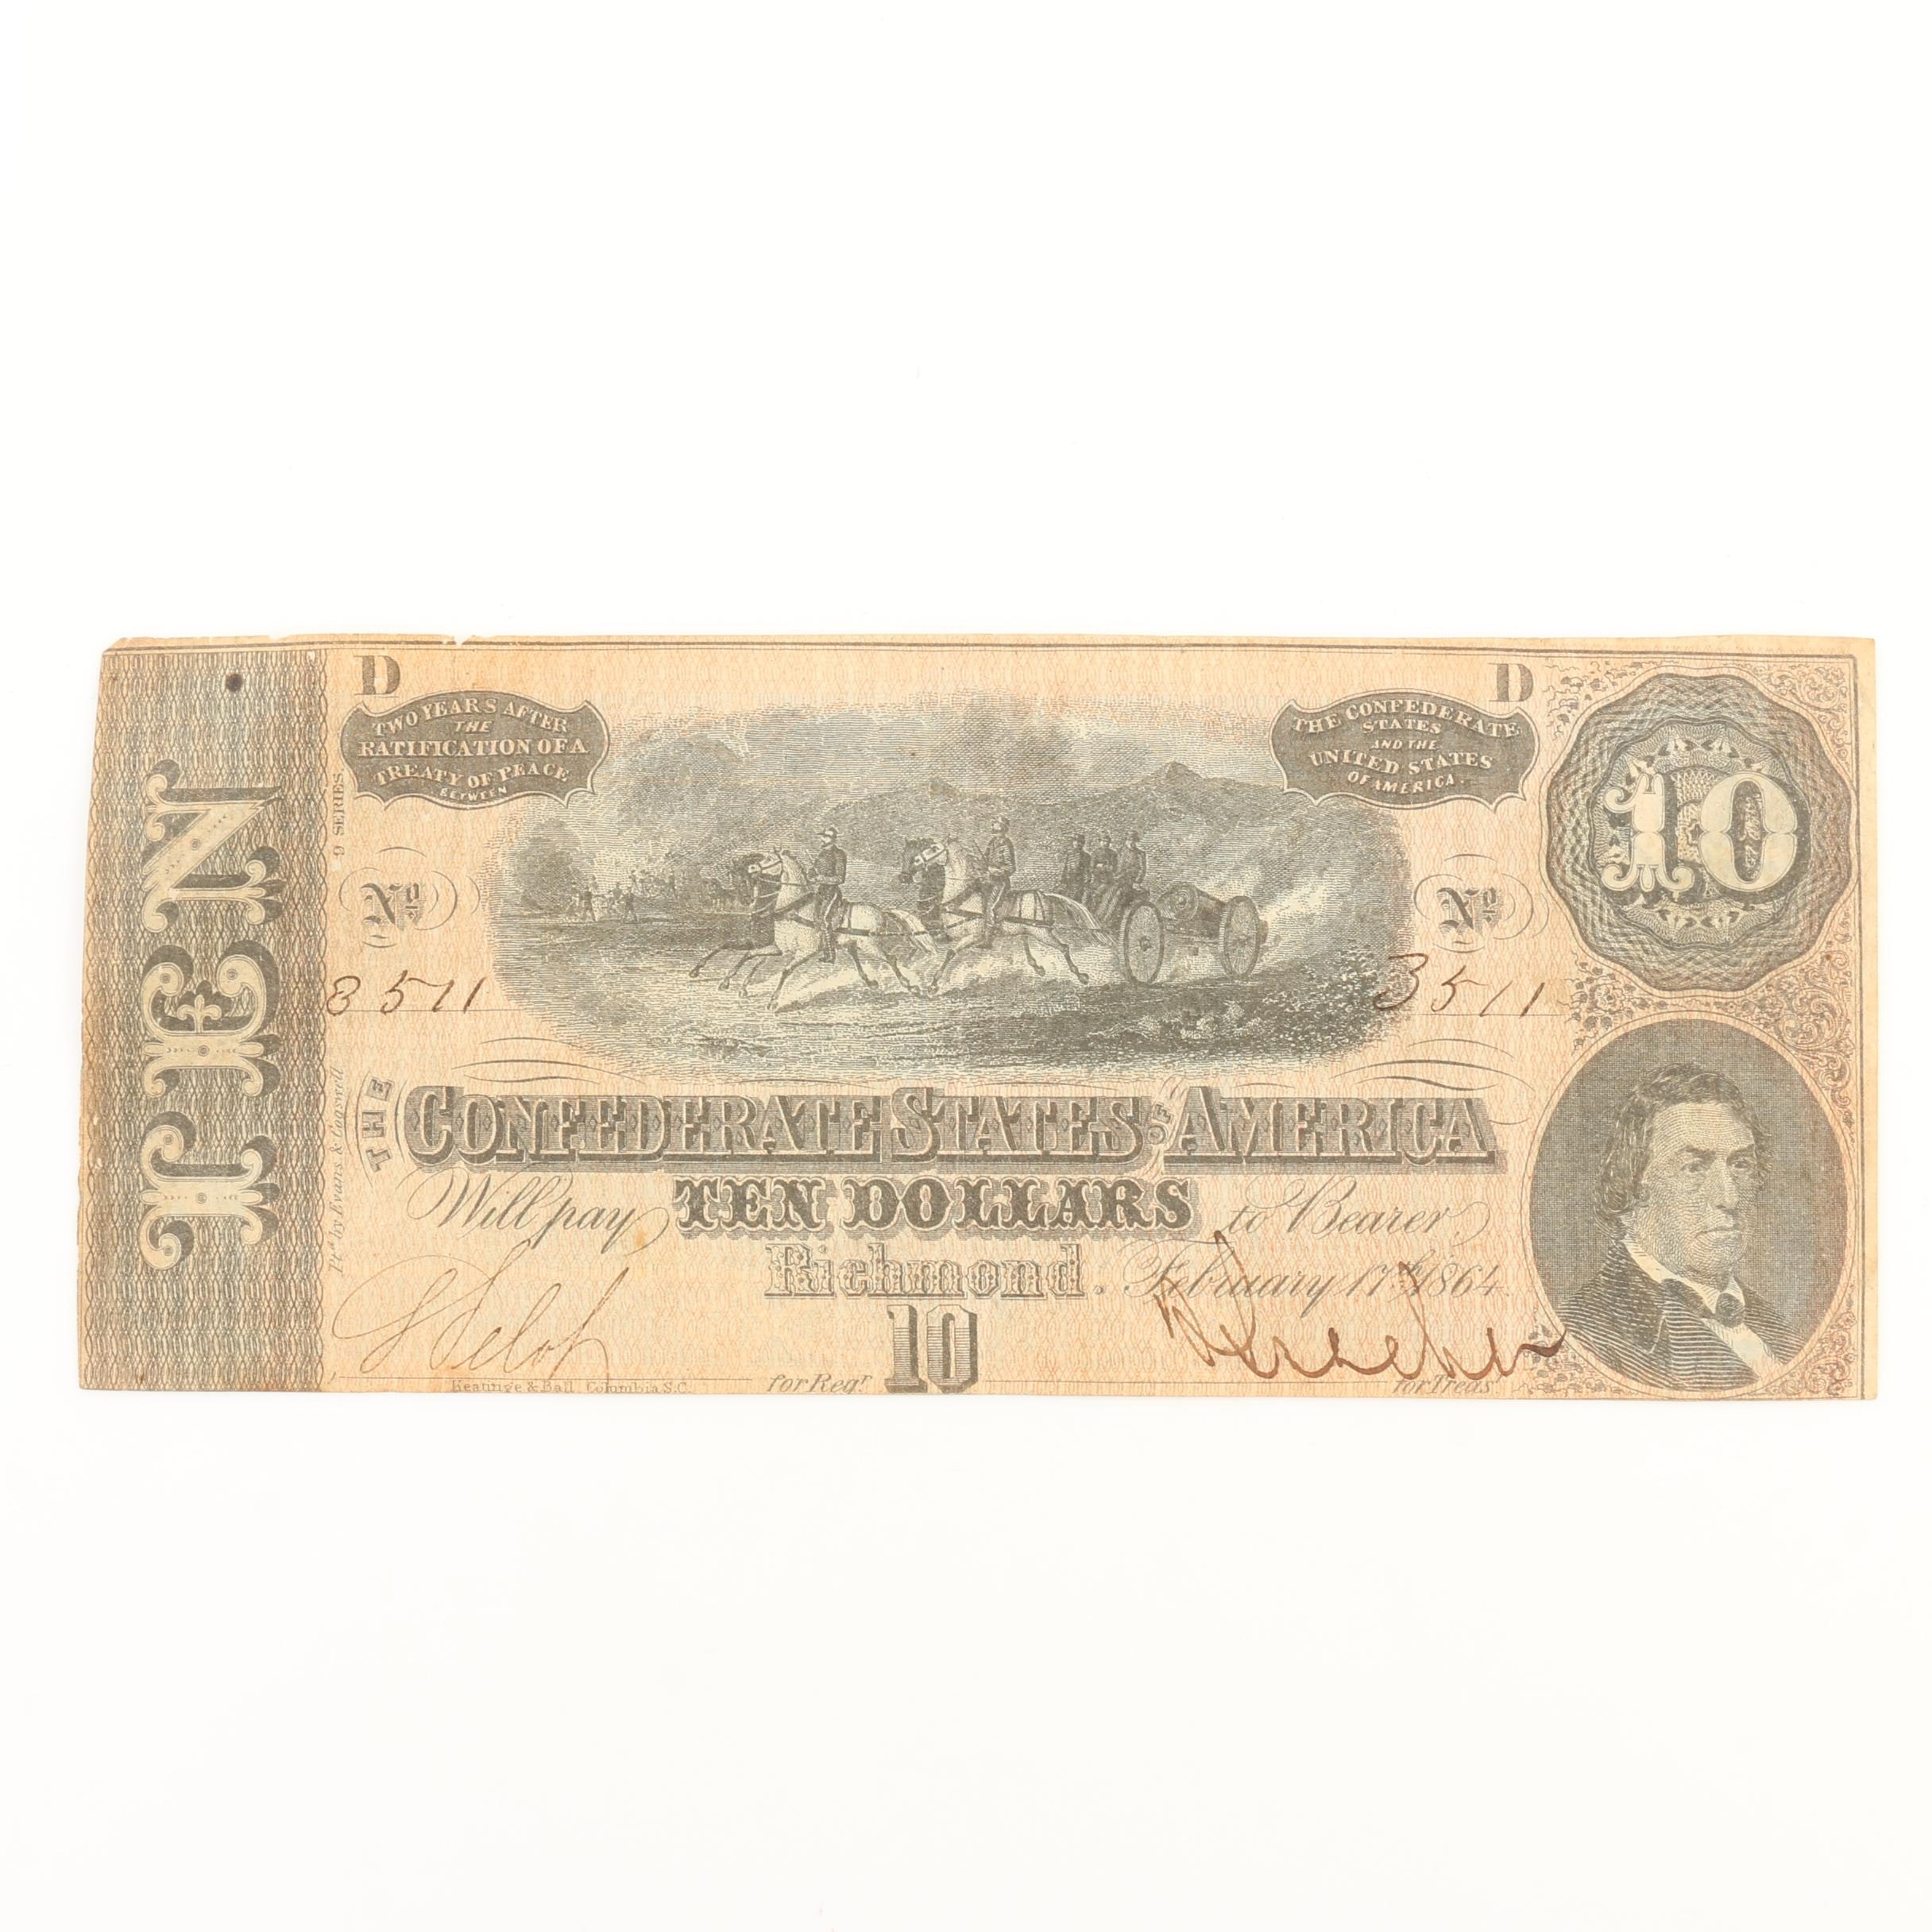 Obsolete $10 Confederate States of America Banknote